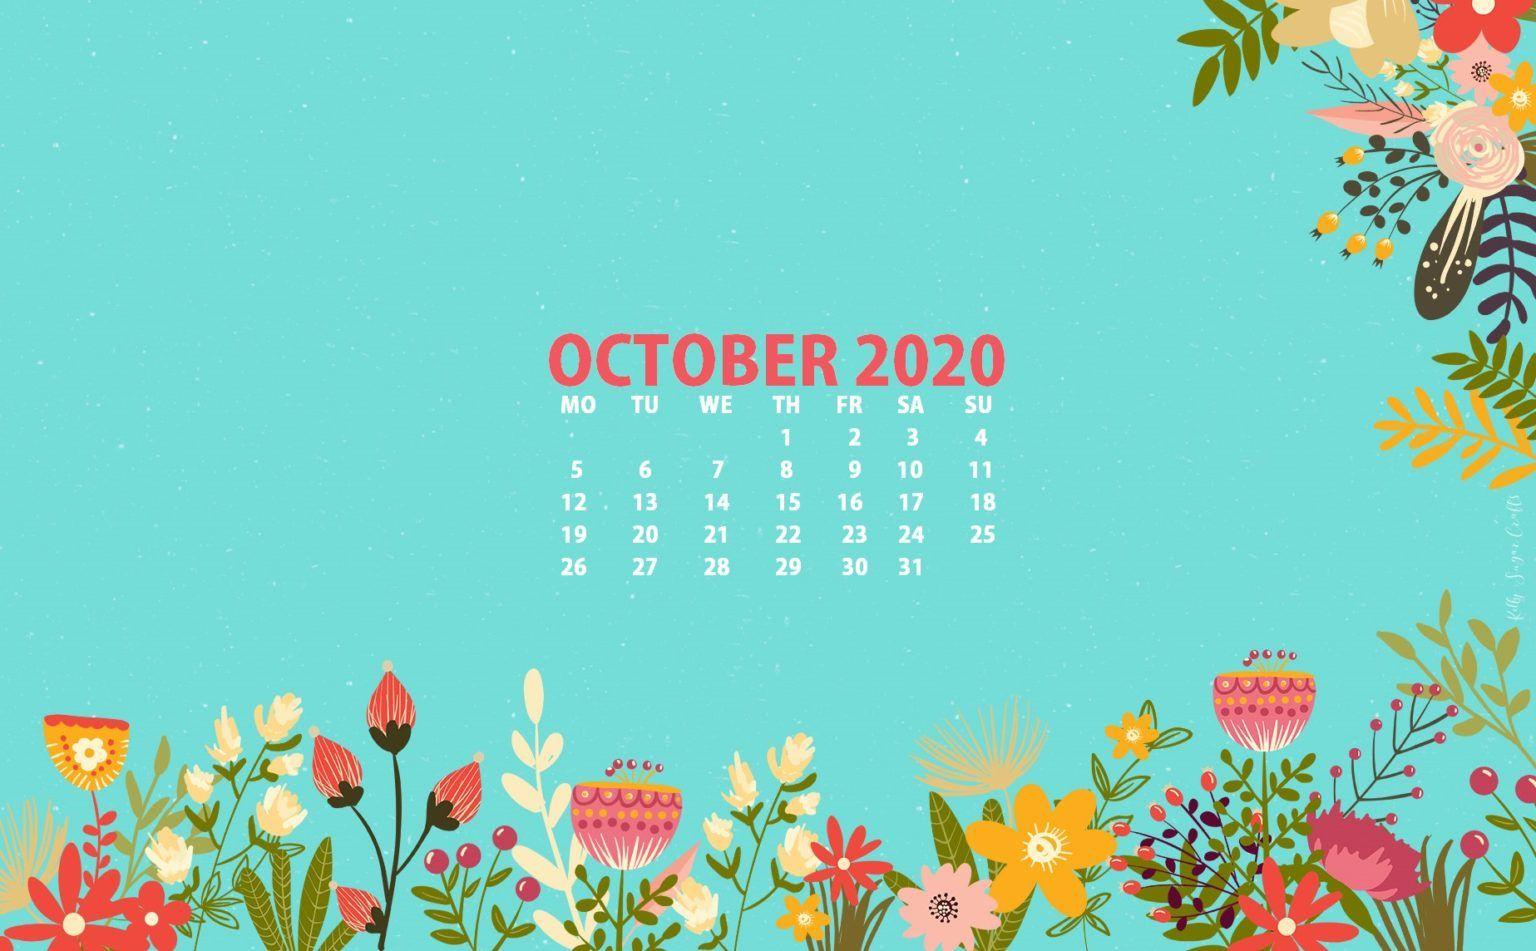 Floral October 2020 Wallpaper In 2020 Calendar Wallpaper October Wallpaper Desktop Wallpaper Calendar